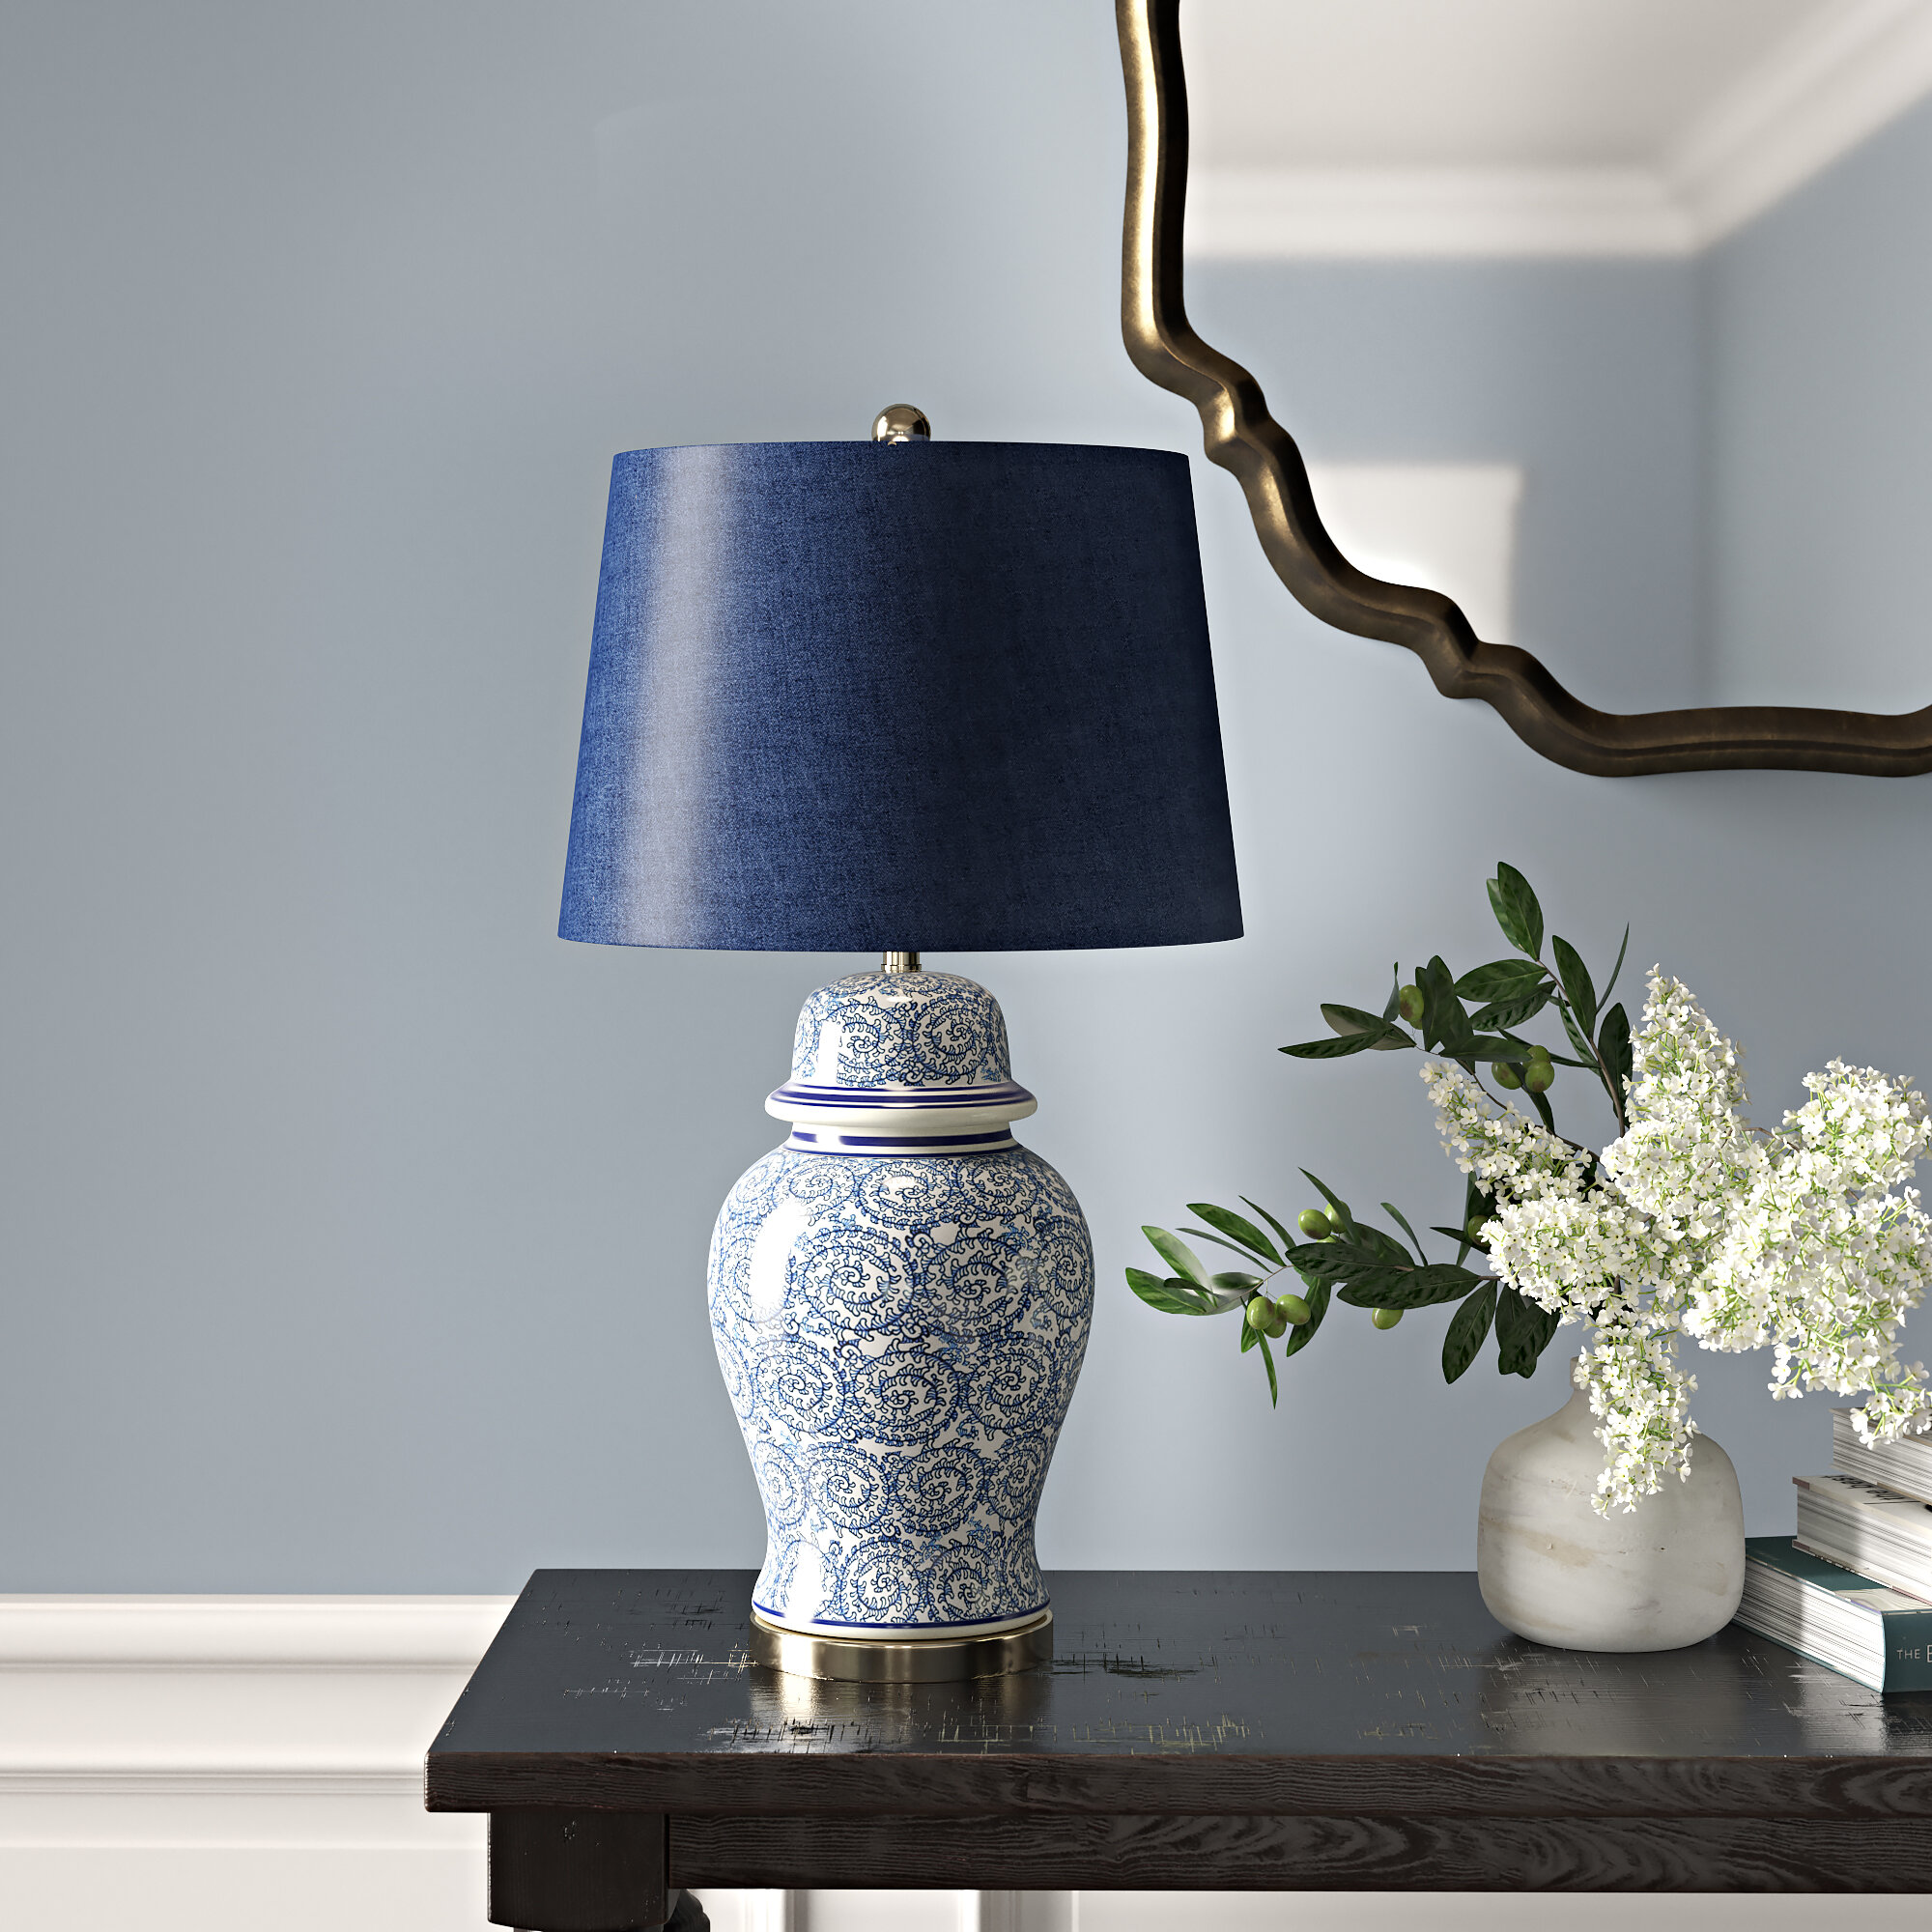 Rennert 31 Table Lamp Reviews Birch Lane